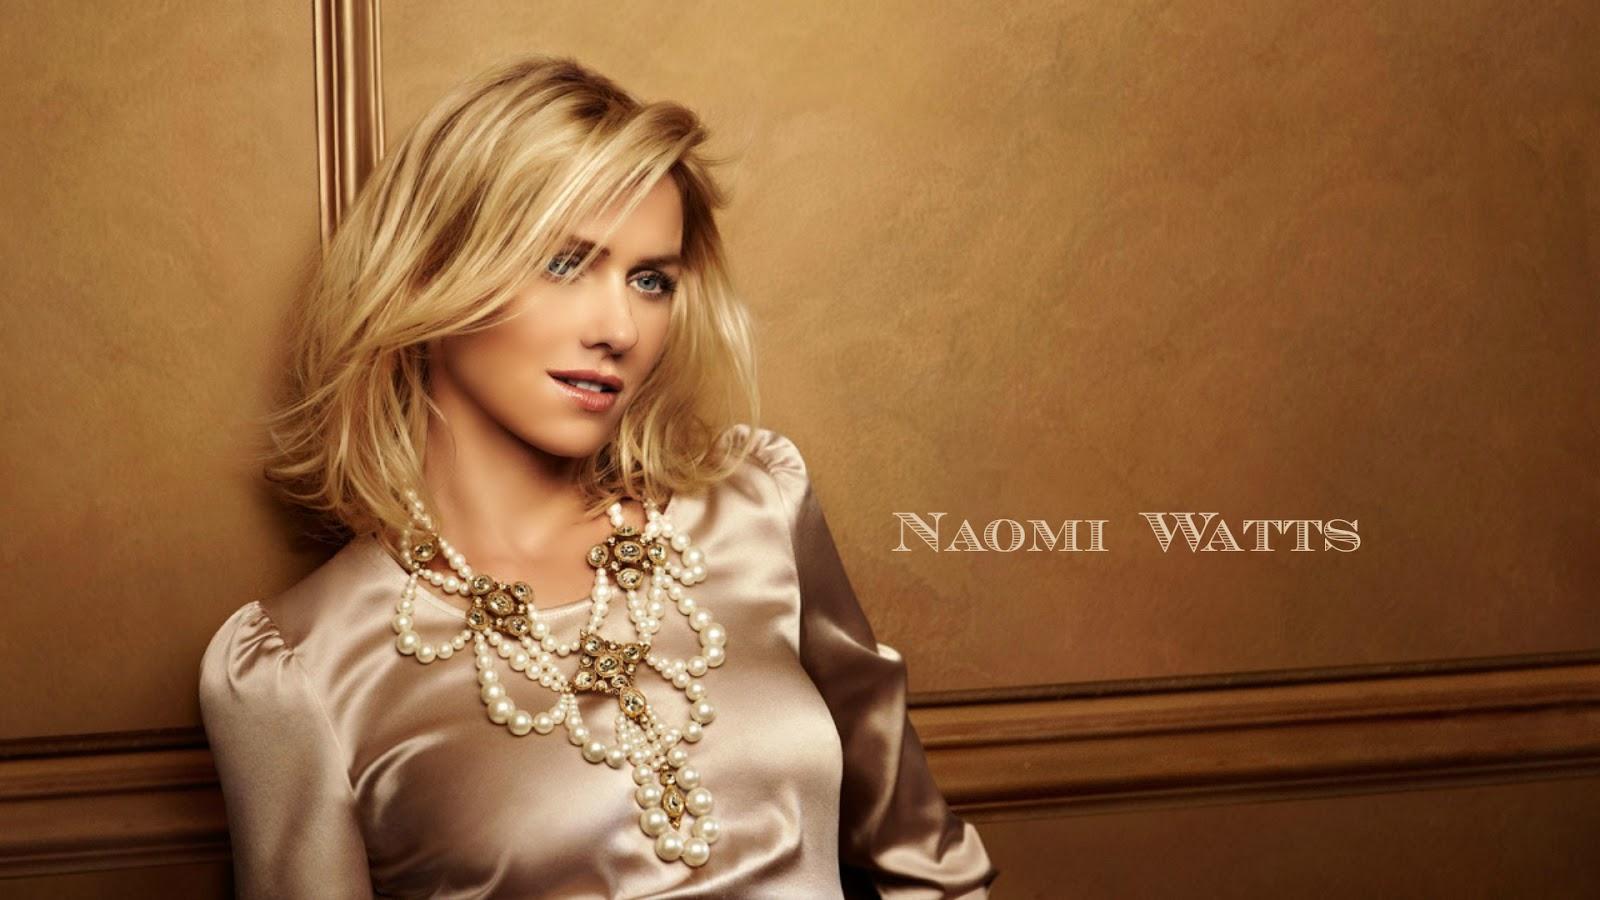 Naomi Watts Wallpapers Hot Famous Celebrities